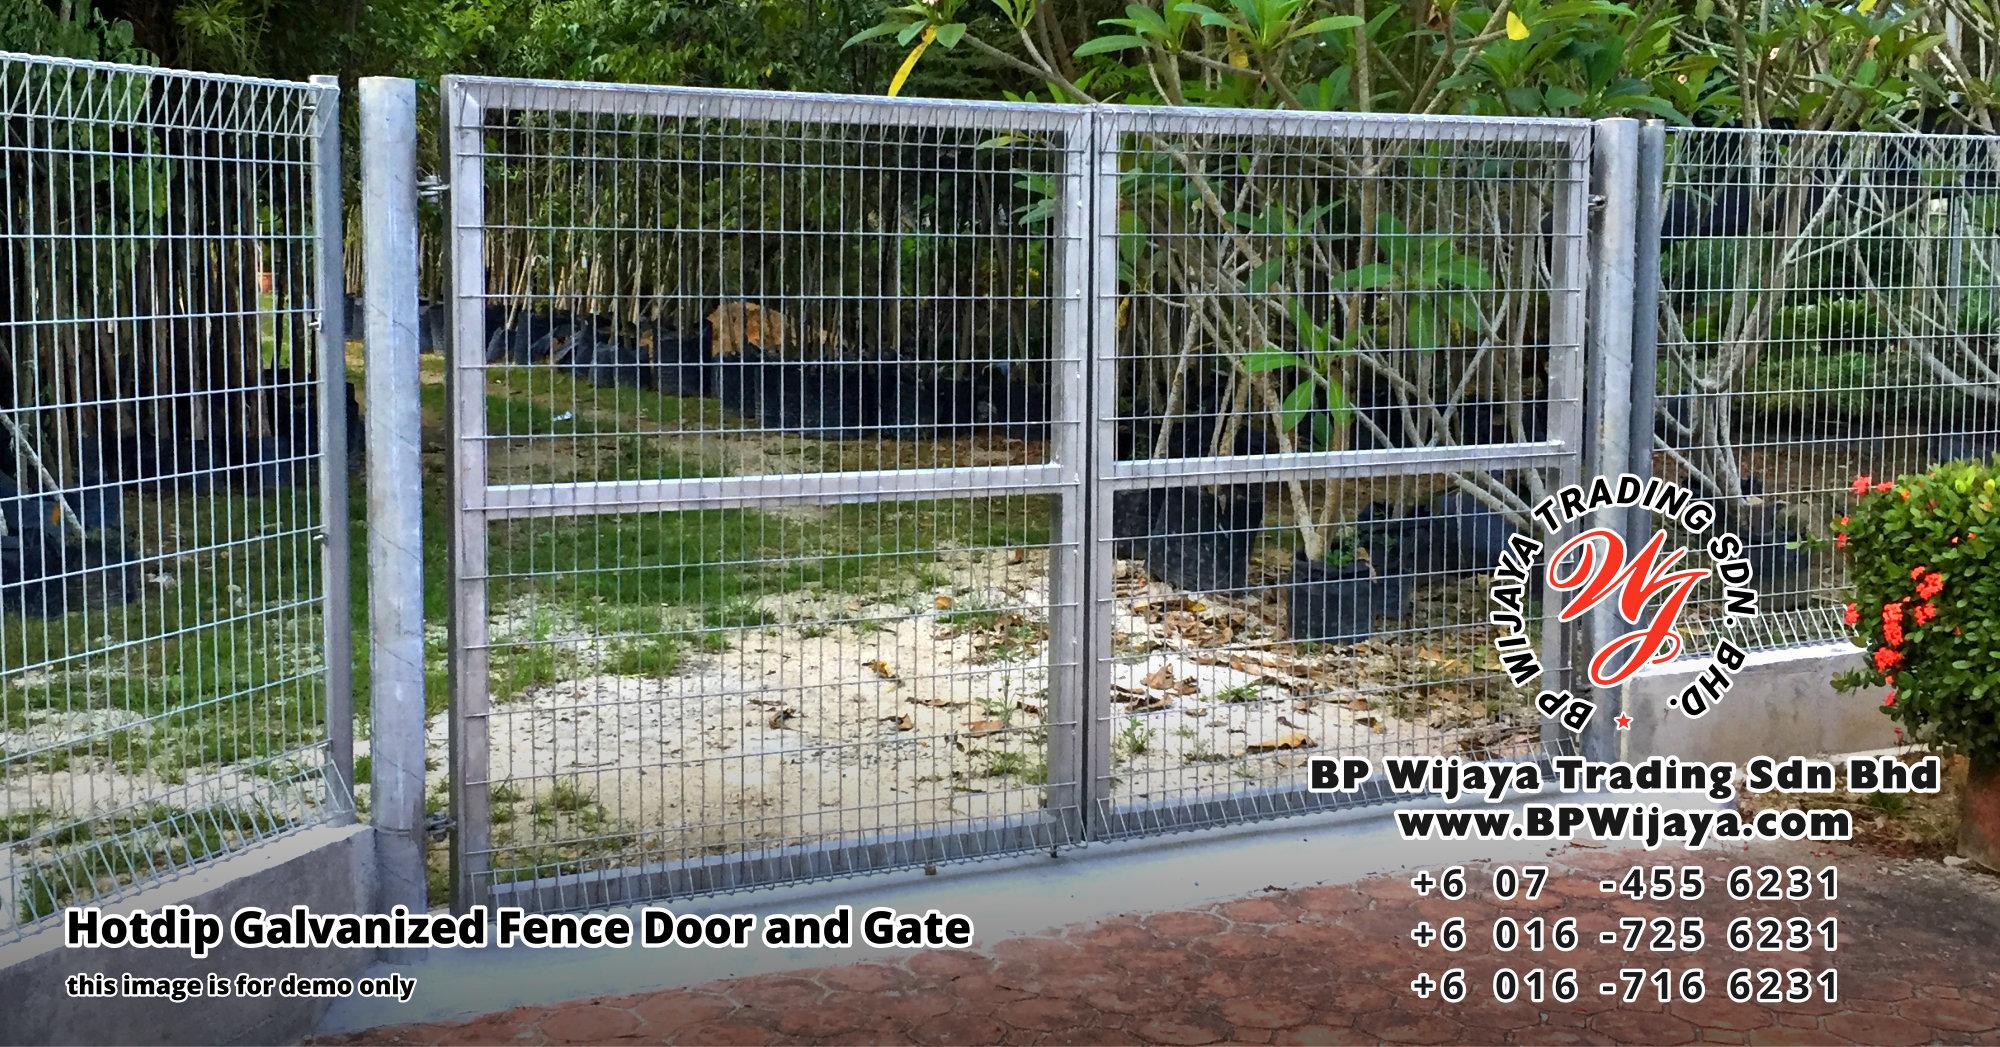 BP Wijaya Security Fence Manufacturer Malaysia Hotdip Galvanized Fence Door and Fence Gate Security Fence Kuala Lumpur Pahang Johor Fence Malaysia A00